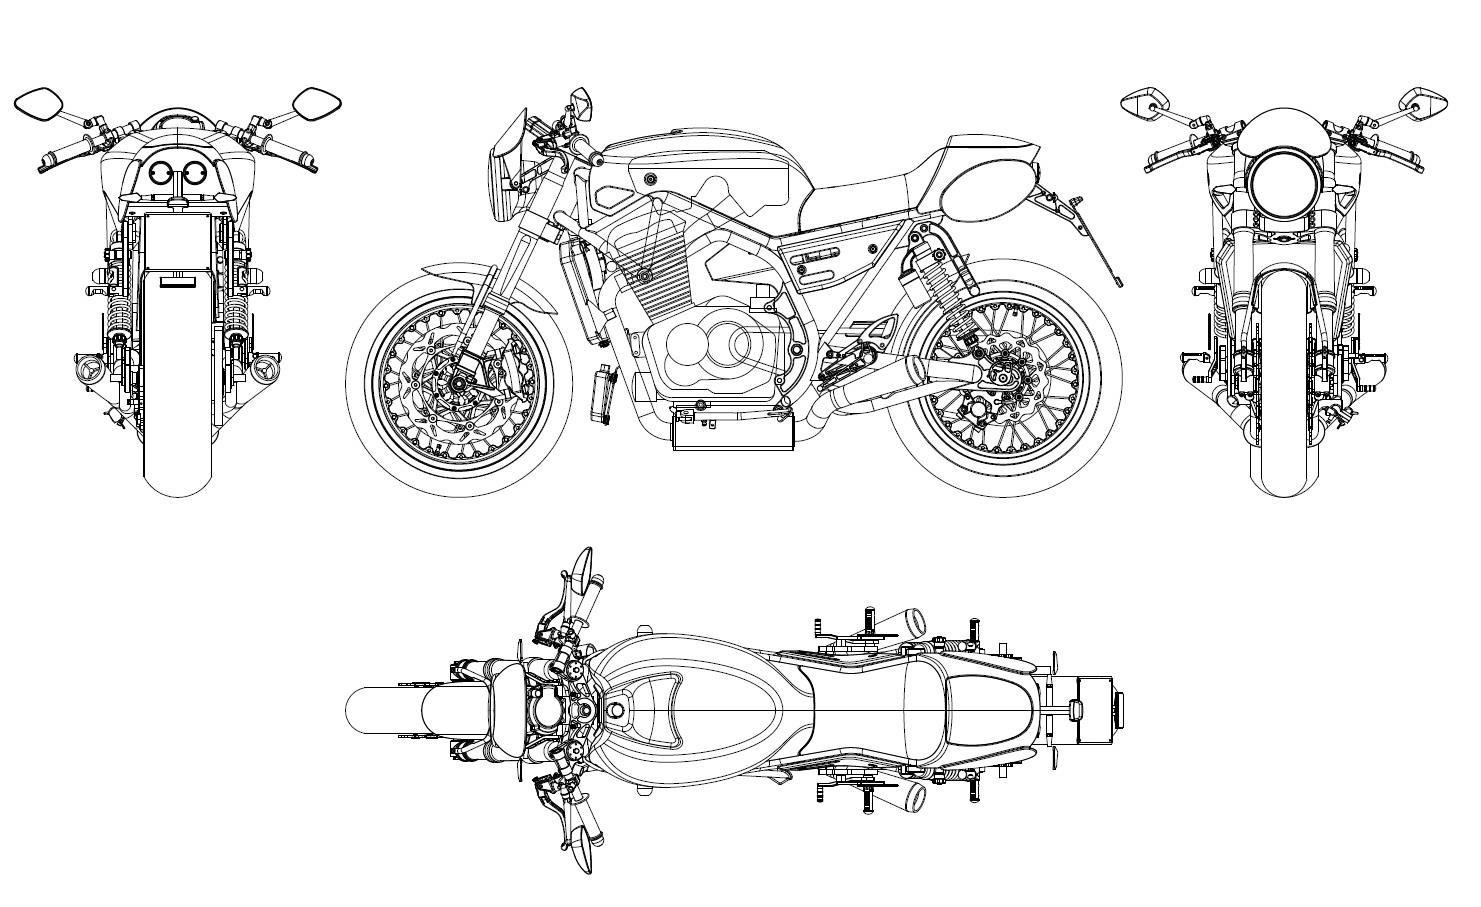 Racing Cafe Breganze Motorcycles Sf 750 Drawings